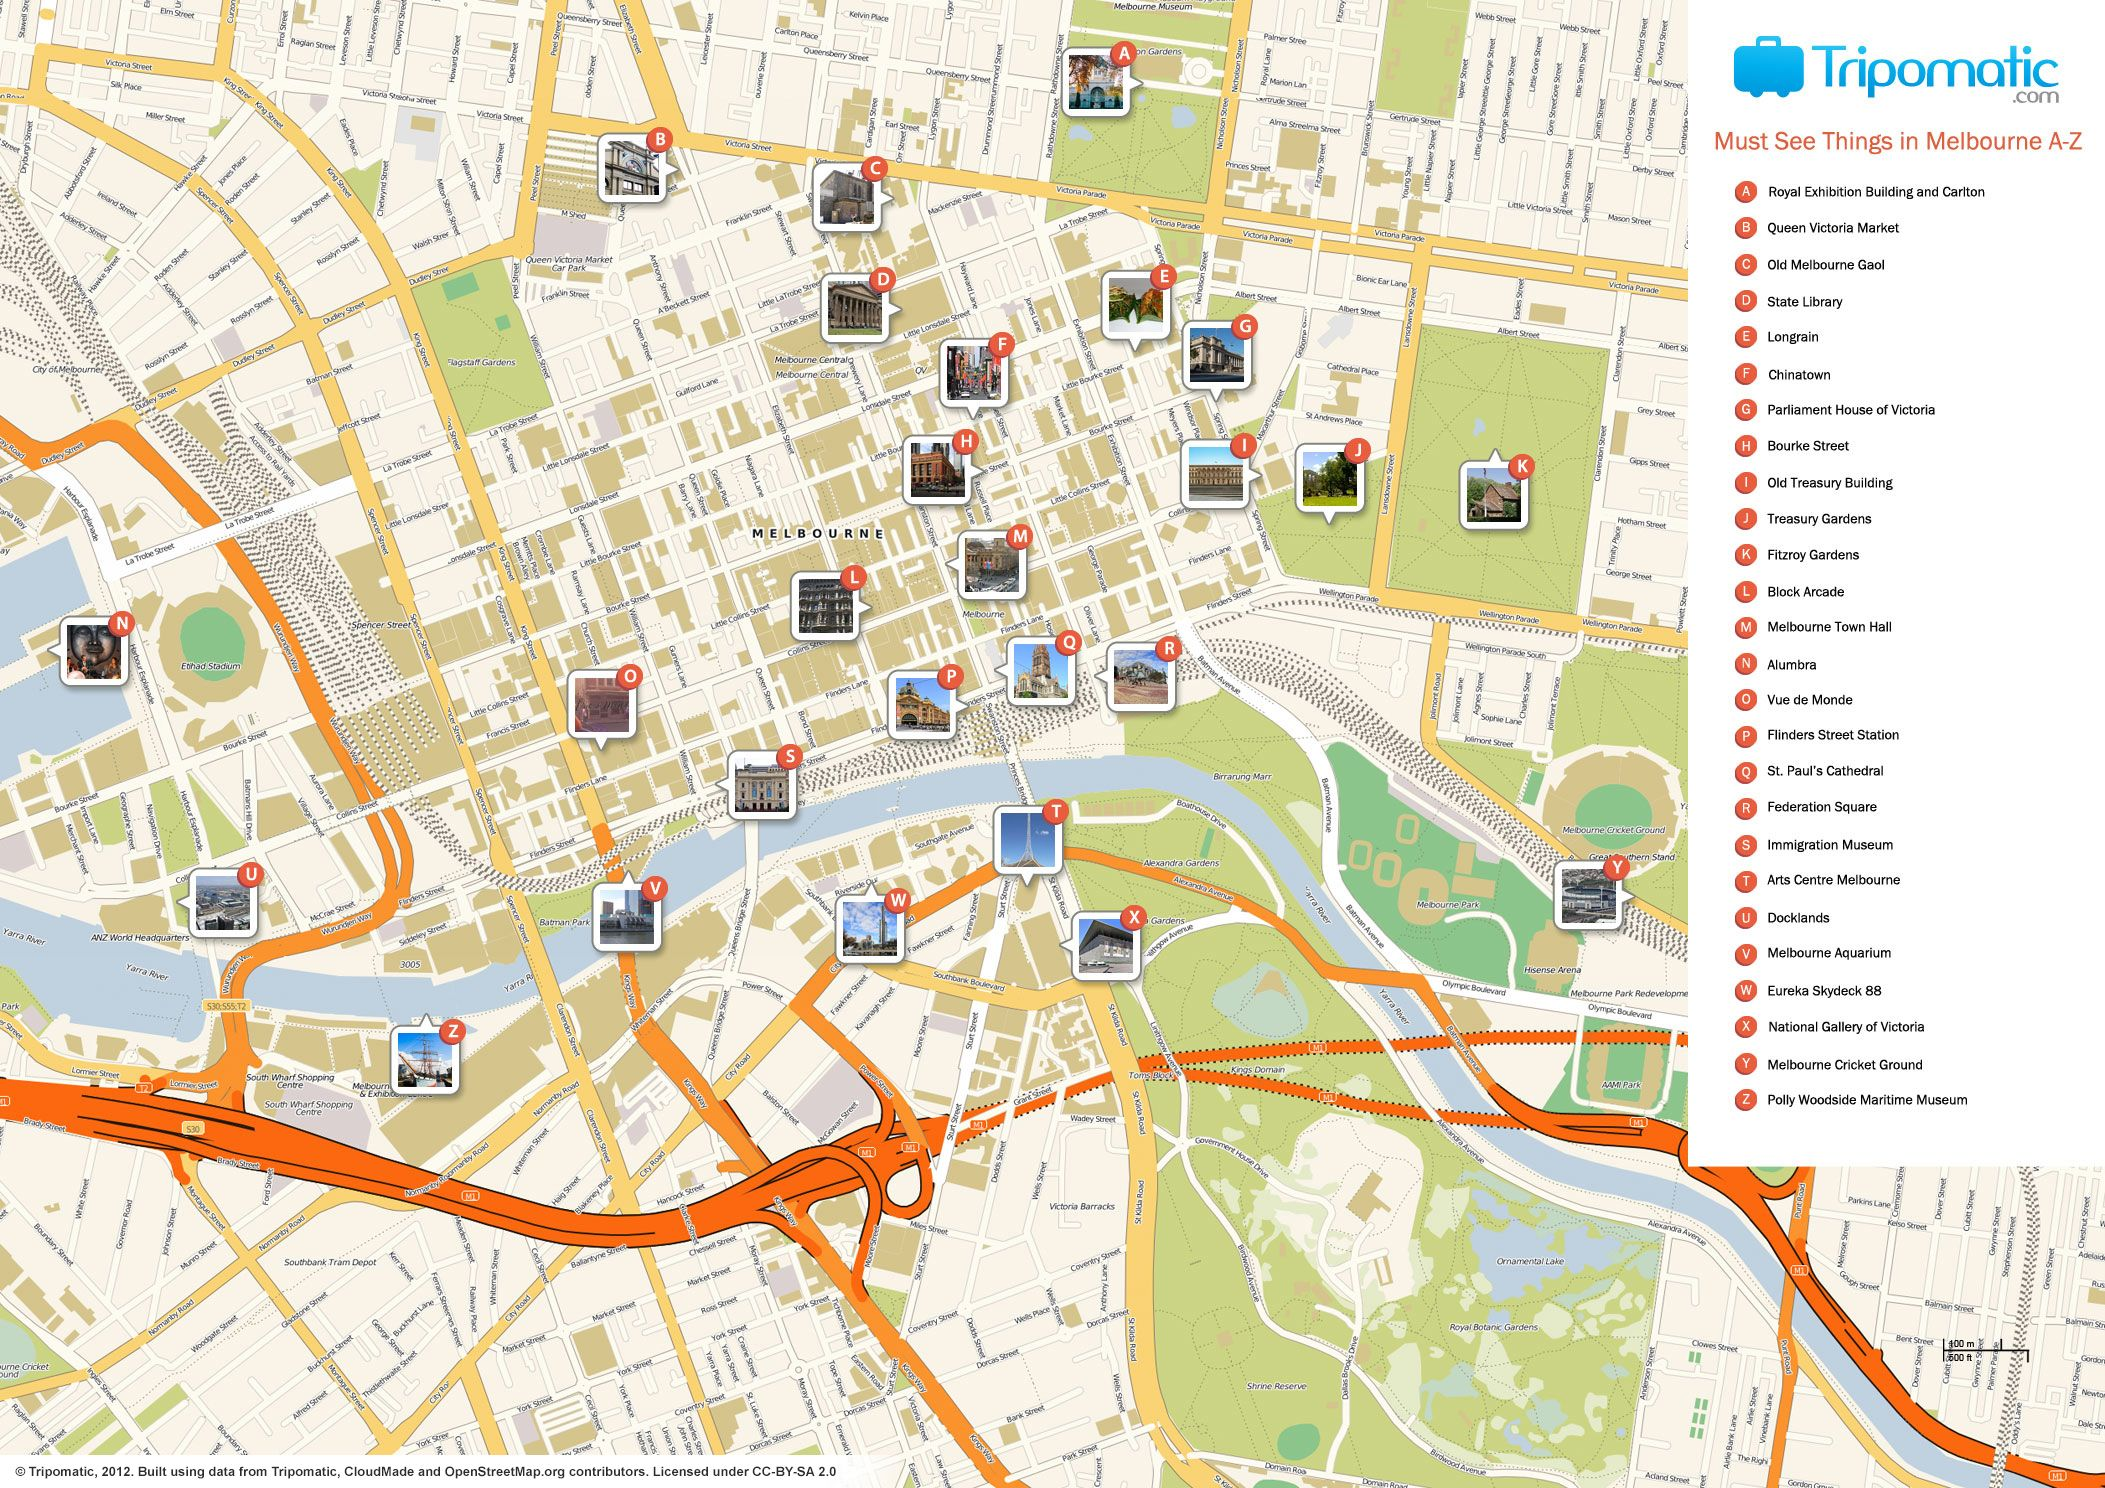 Map of Melbourne attractions Tripomaticcom Australia 2016